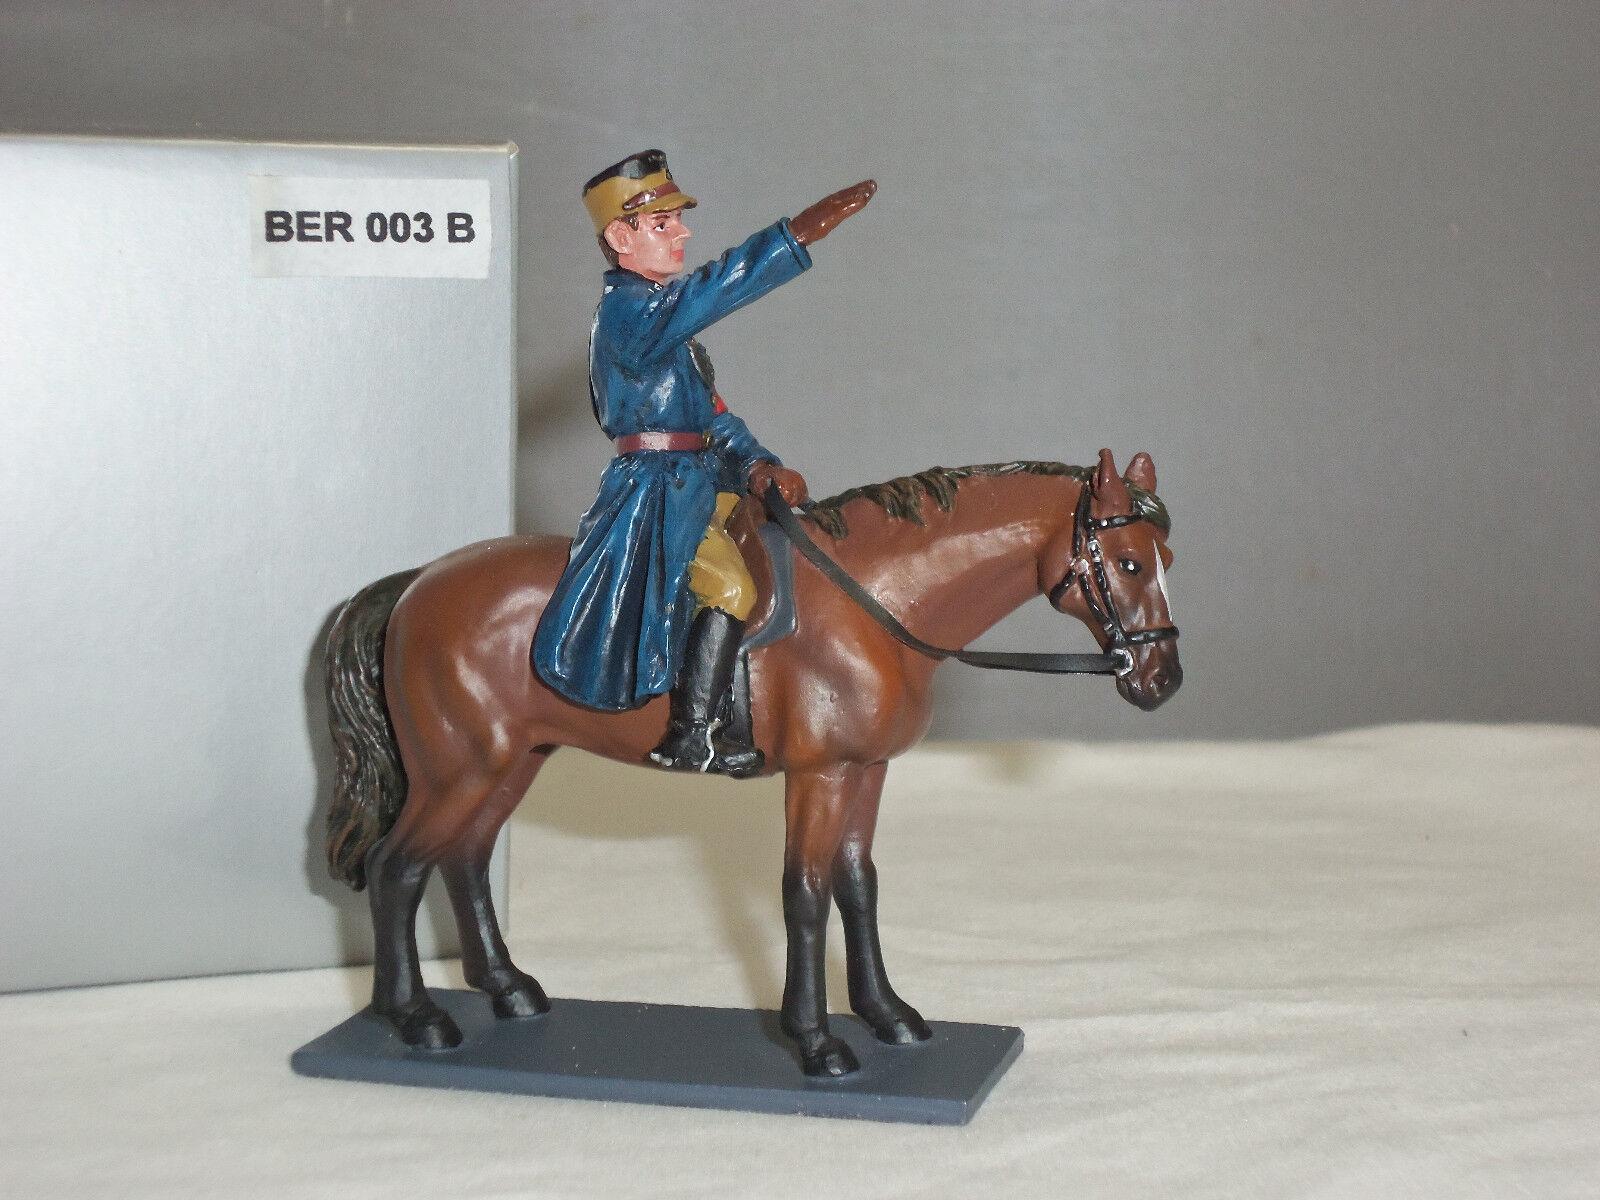 THOMAS GUNN BER003B GERMAN WORLD WAR TWO POLICEMAN MOUNTED ON HORSE FIGURE